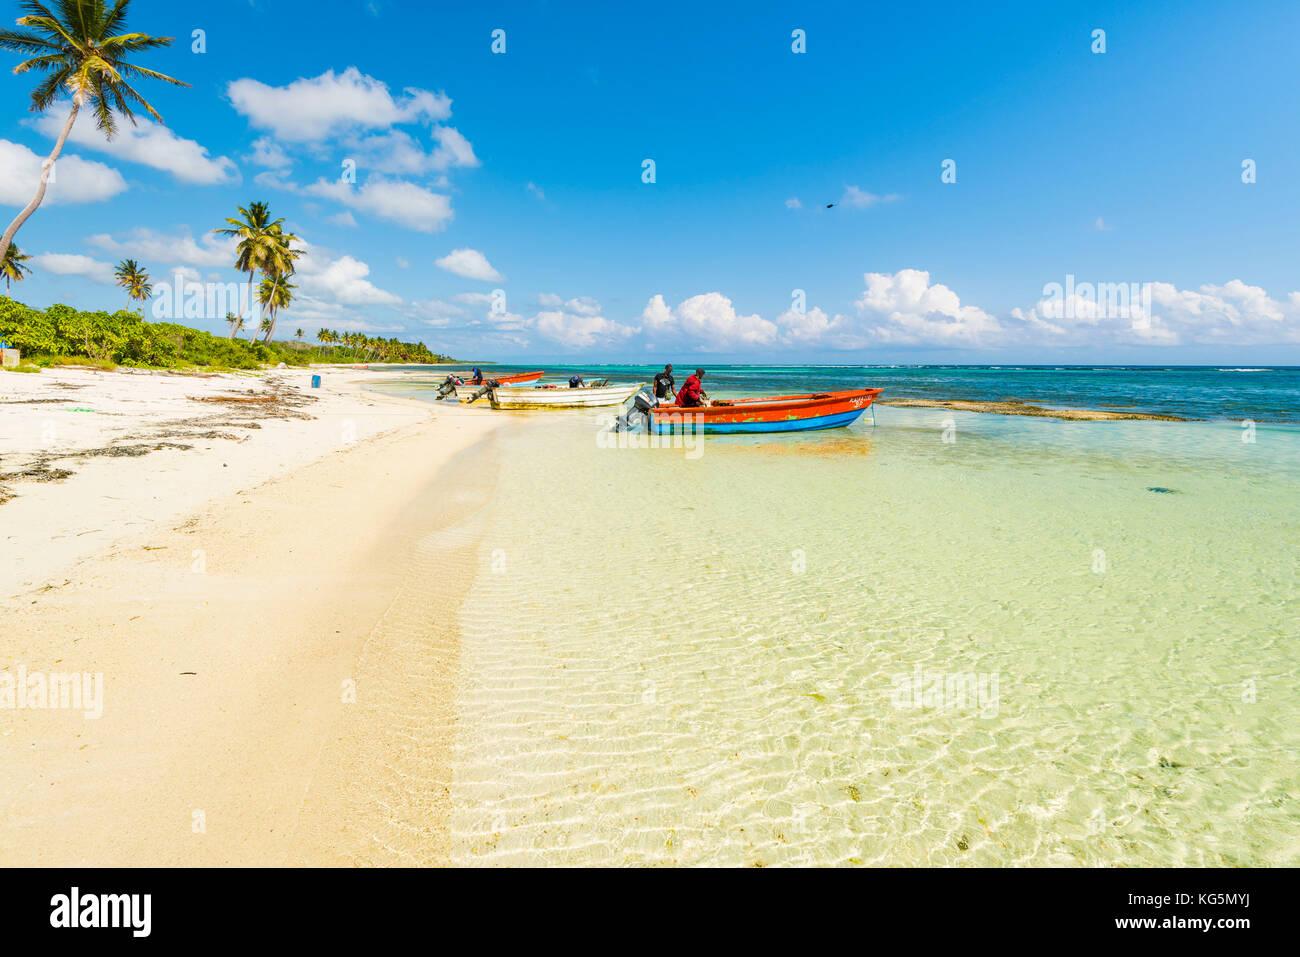 Mano Juan, Isla Saona, East National Park (Parque Nacional del Este), en la República Dominicana, Mar Caribe. Foto de stock